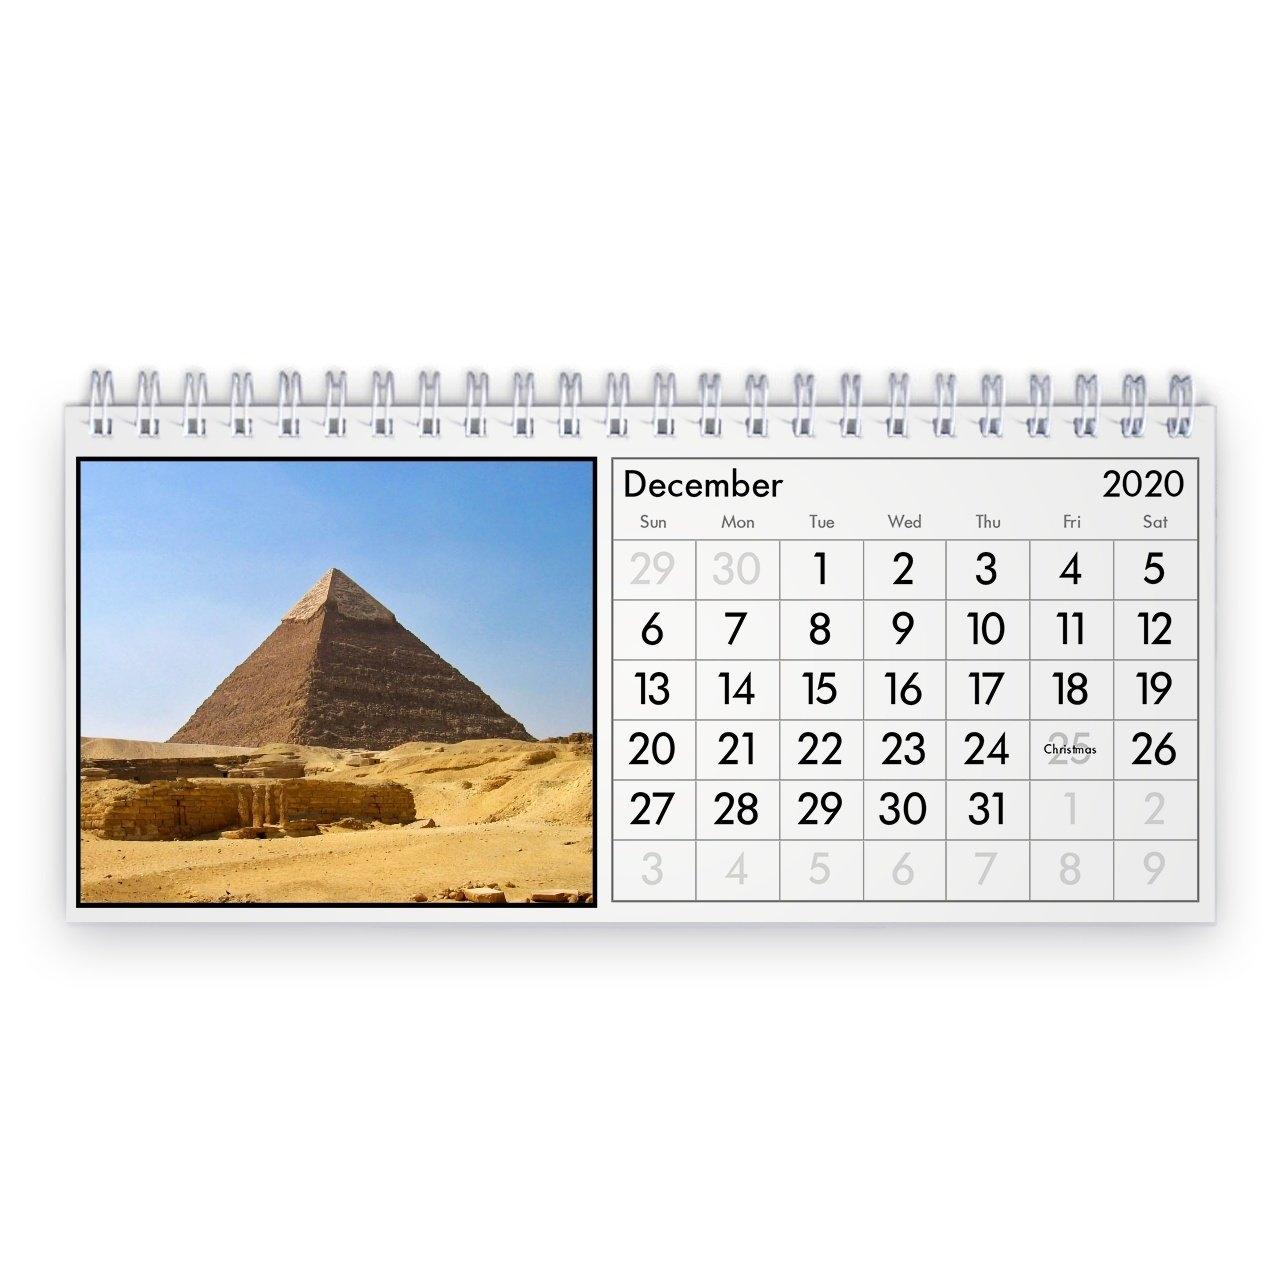 Egypte 2021 Bureau Kalender throughout Egypt Holiday Calendar 2021 Photo